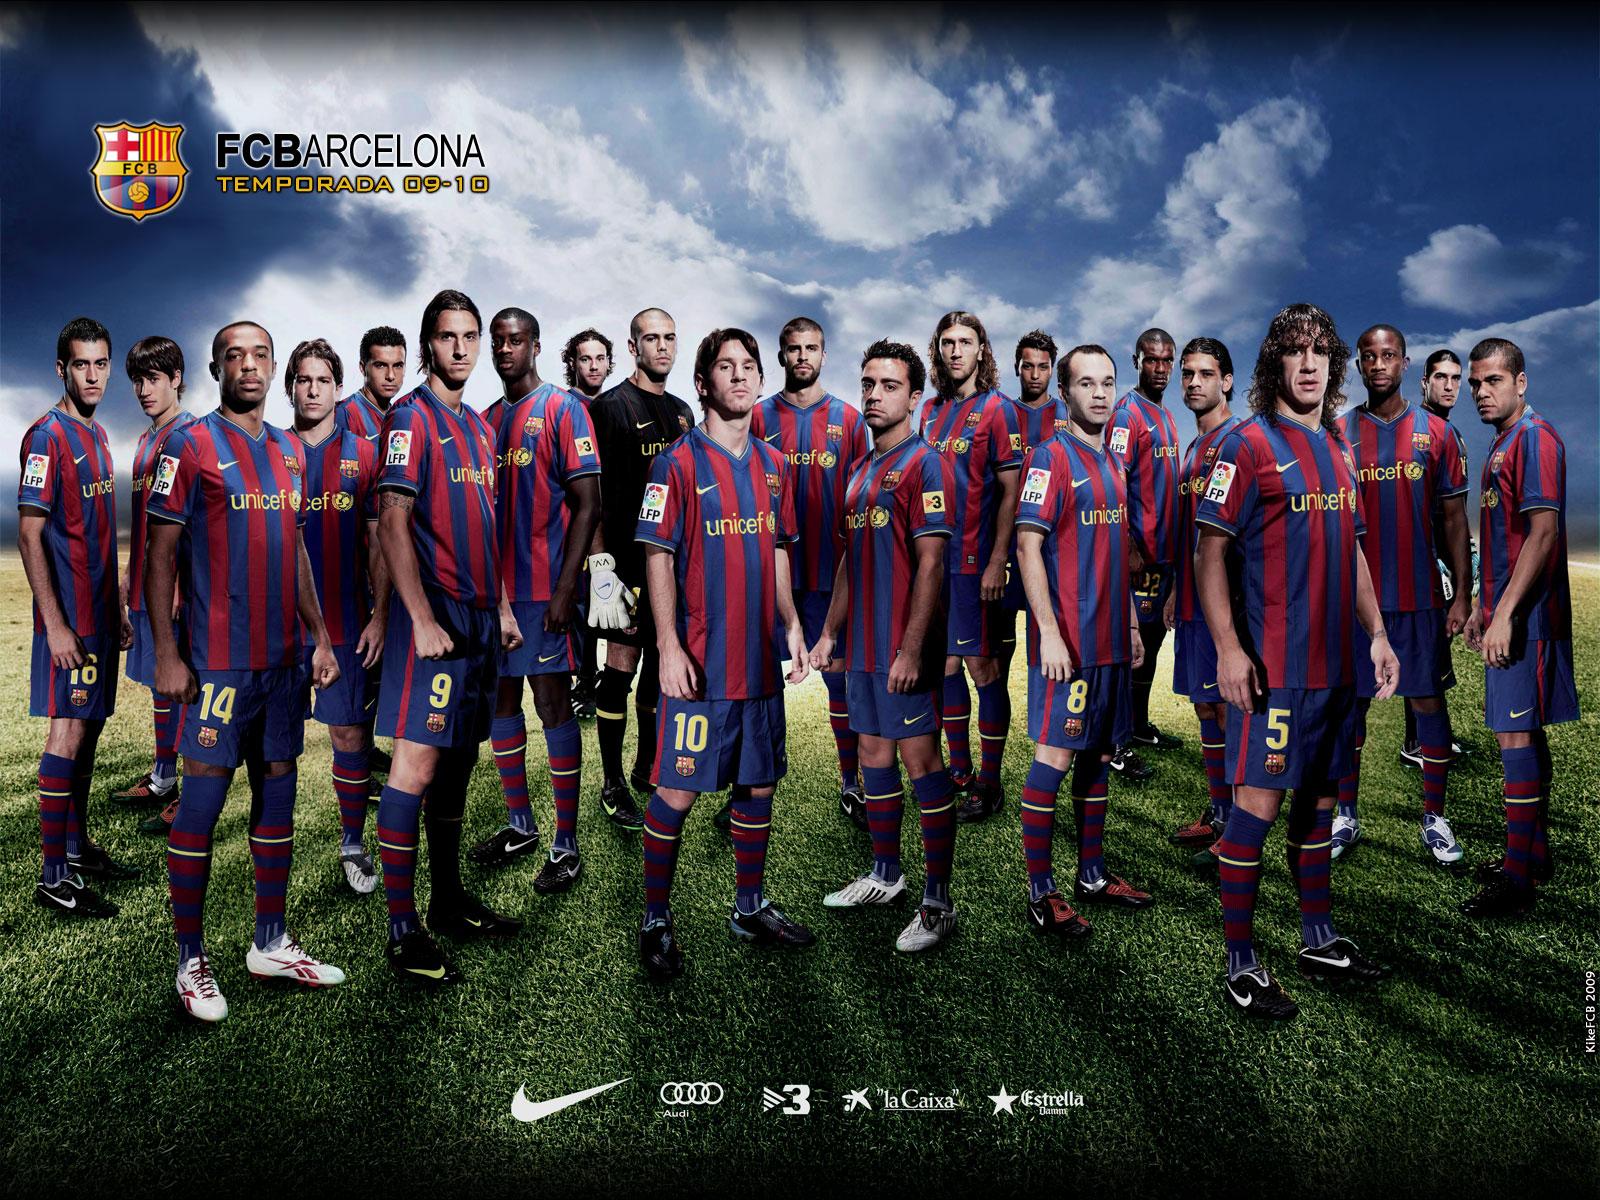 http://3.bp.blogspot.com/-16CZ2rMb3M0/TqV-wHBy86I/AAAAAAAAAHY/0m7kMGnCroI/s1600/FC-Barcelona-Team-wallpaper-2.png